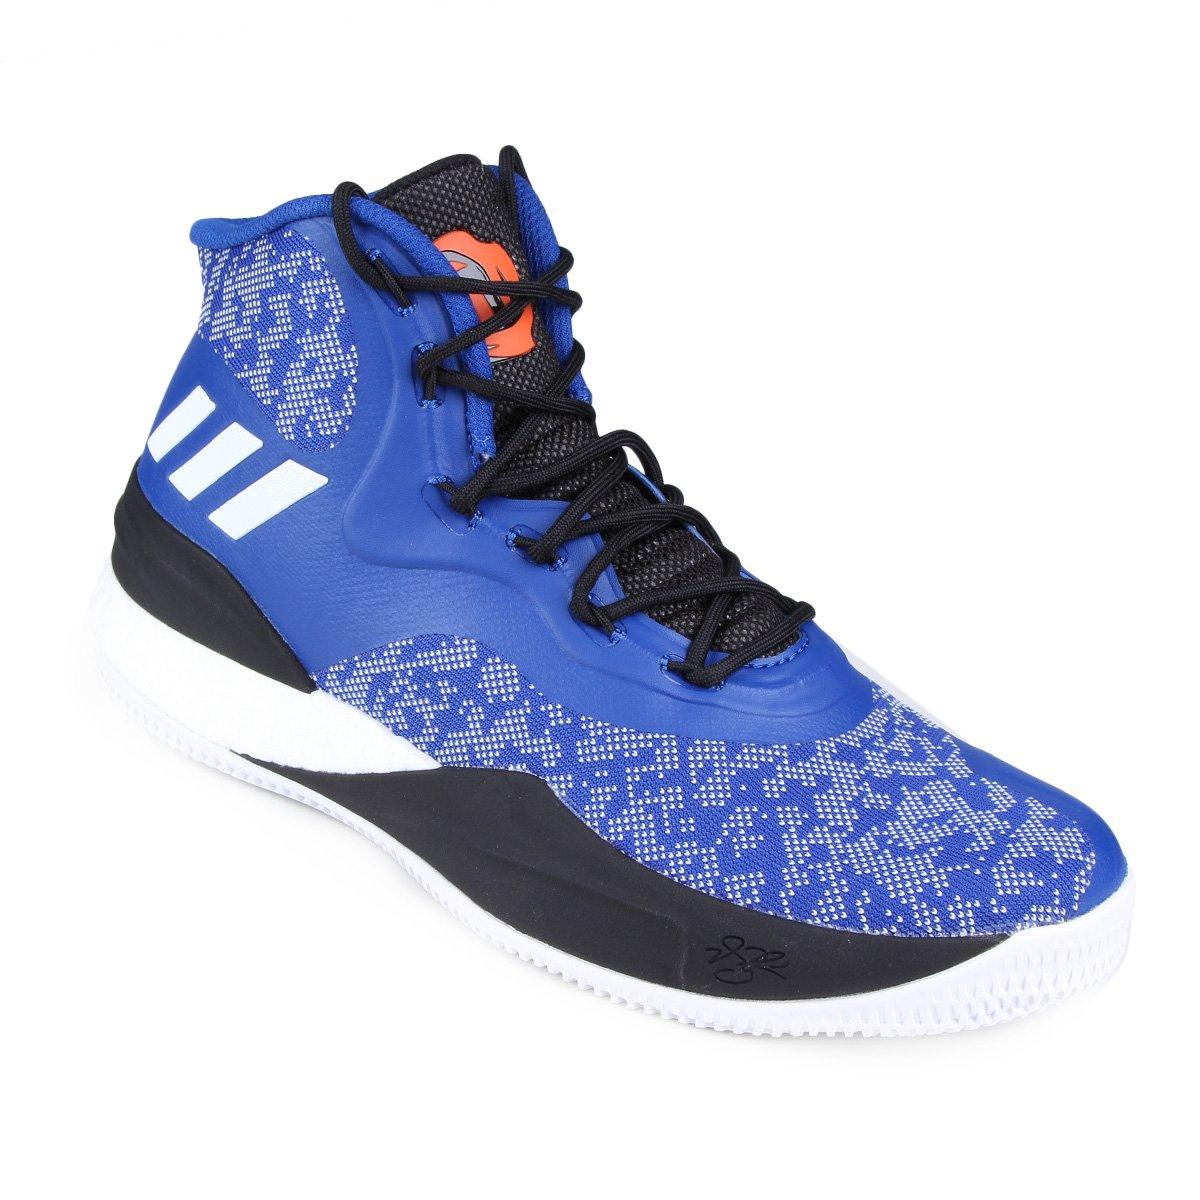 fff98a601 Tênis Adidas Derrick Rose 8 Masculino - Compre Agora